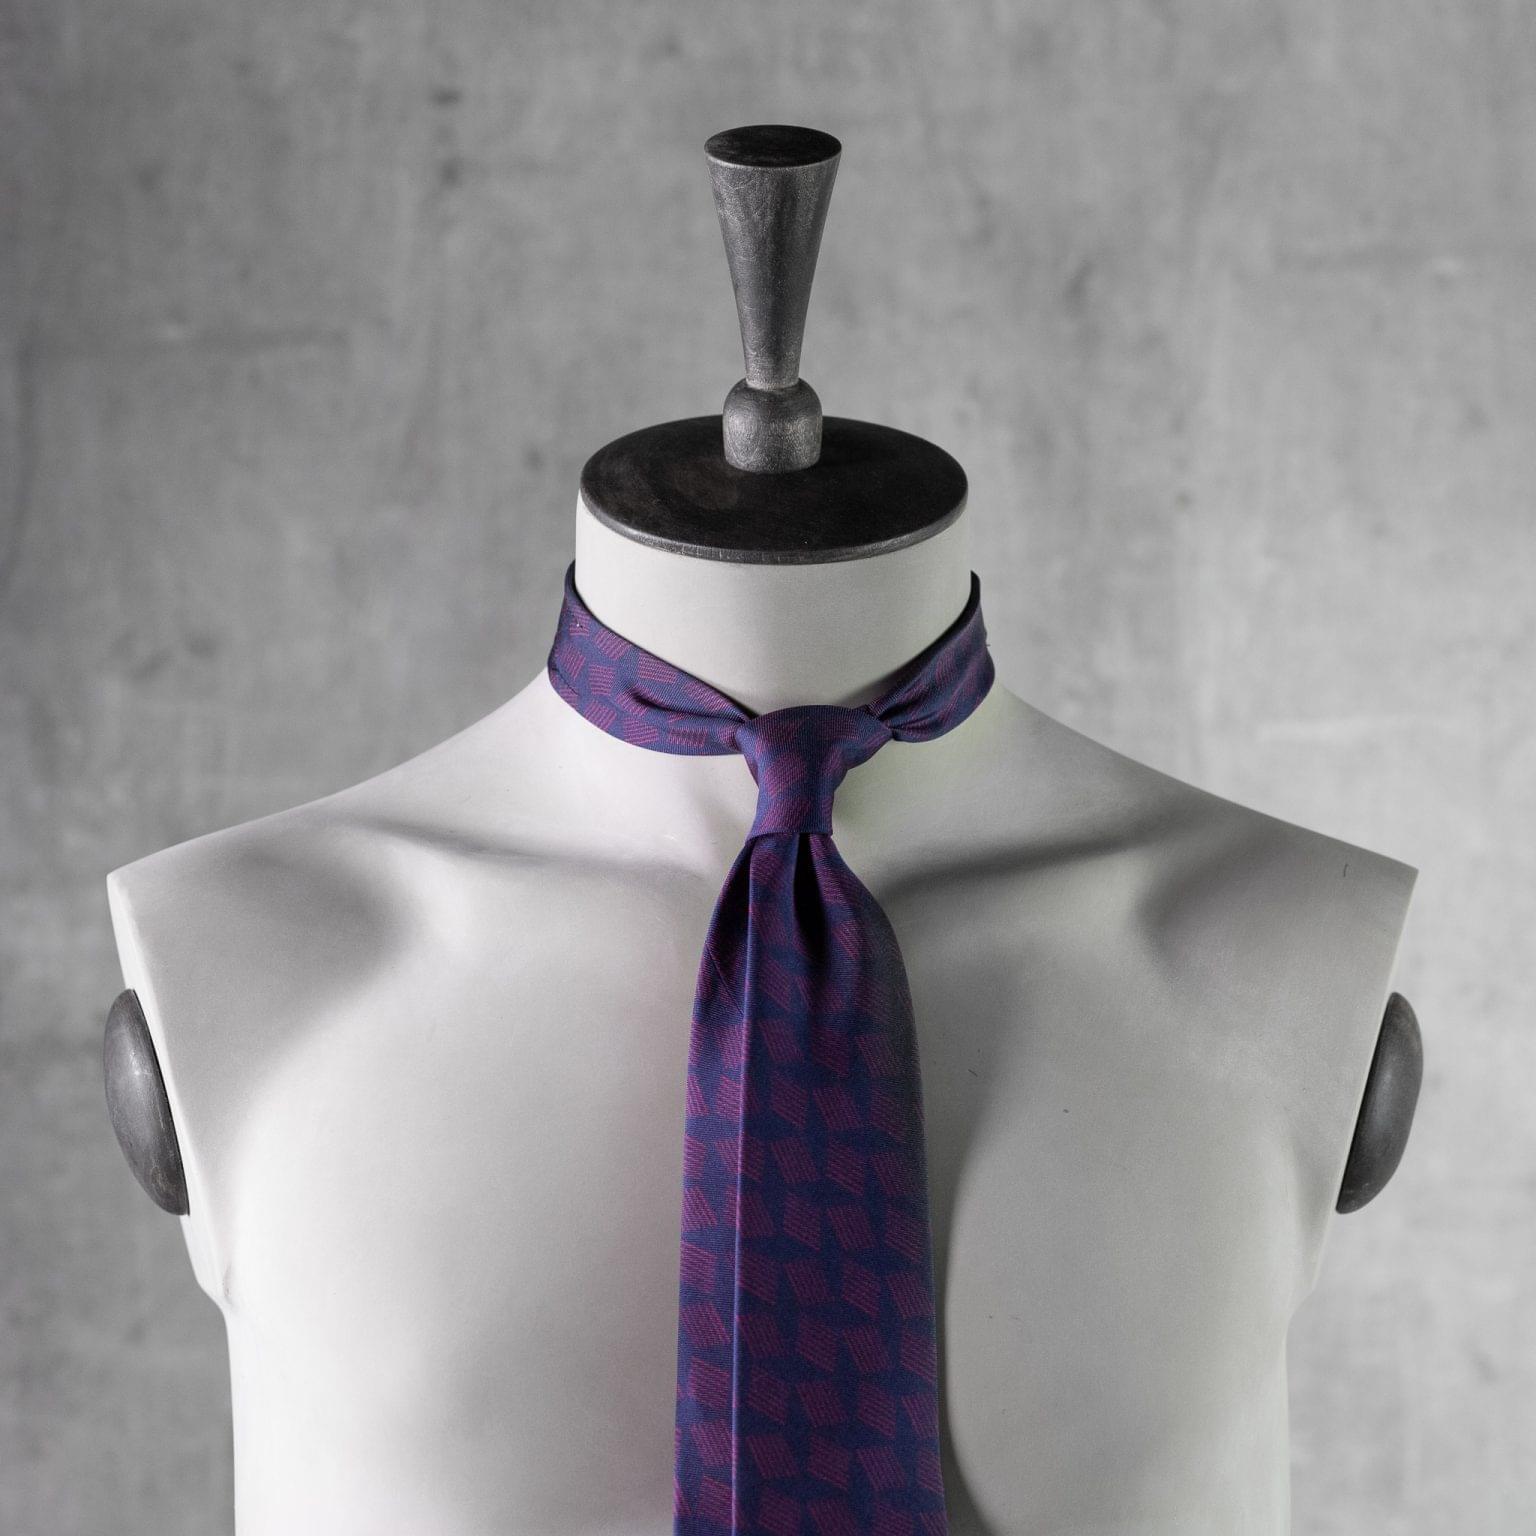 PRINTED-SILK-SEDA-ESTAMPADA-0483-Tie-Initials-Corbata-Iniciales-The-Seelk-3